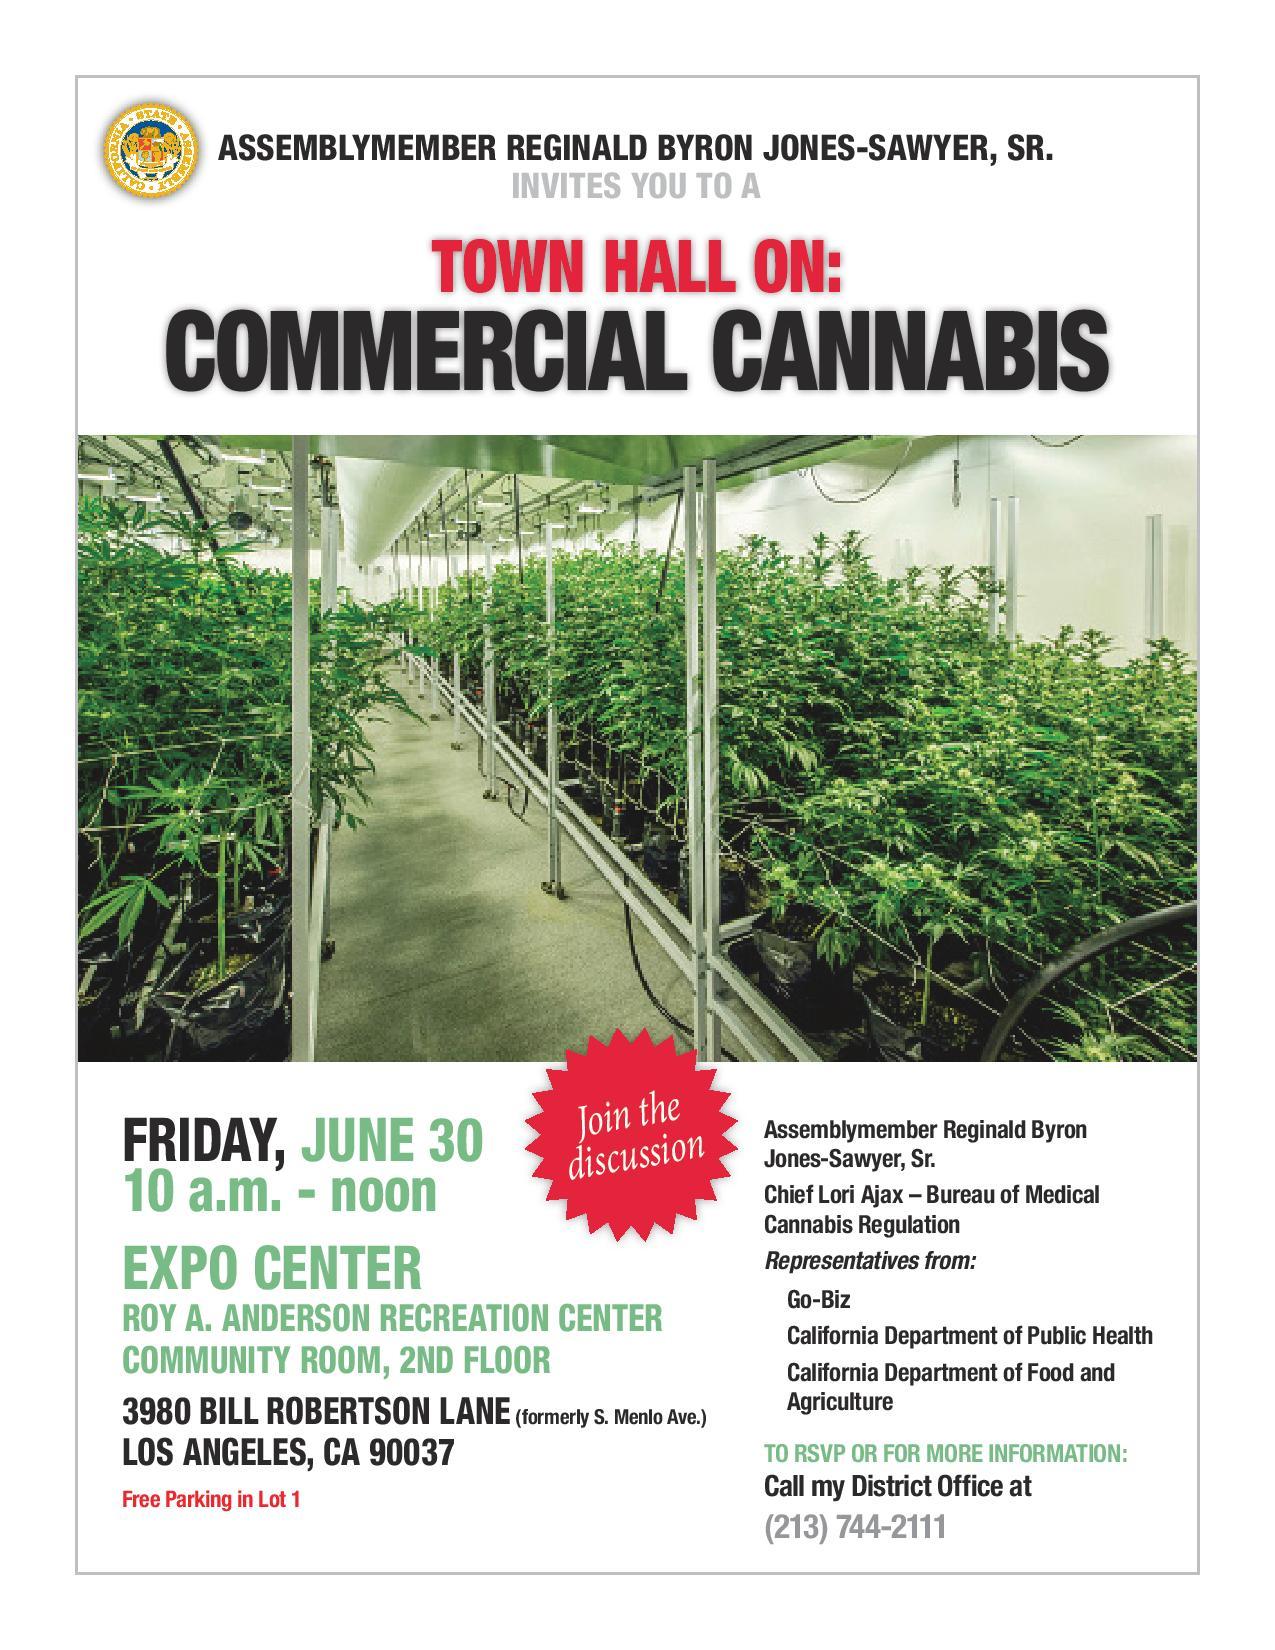 Jones-Sawyer-Cannabis_Town_Hall.jpg